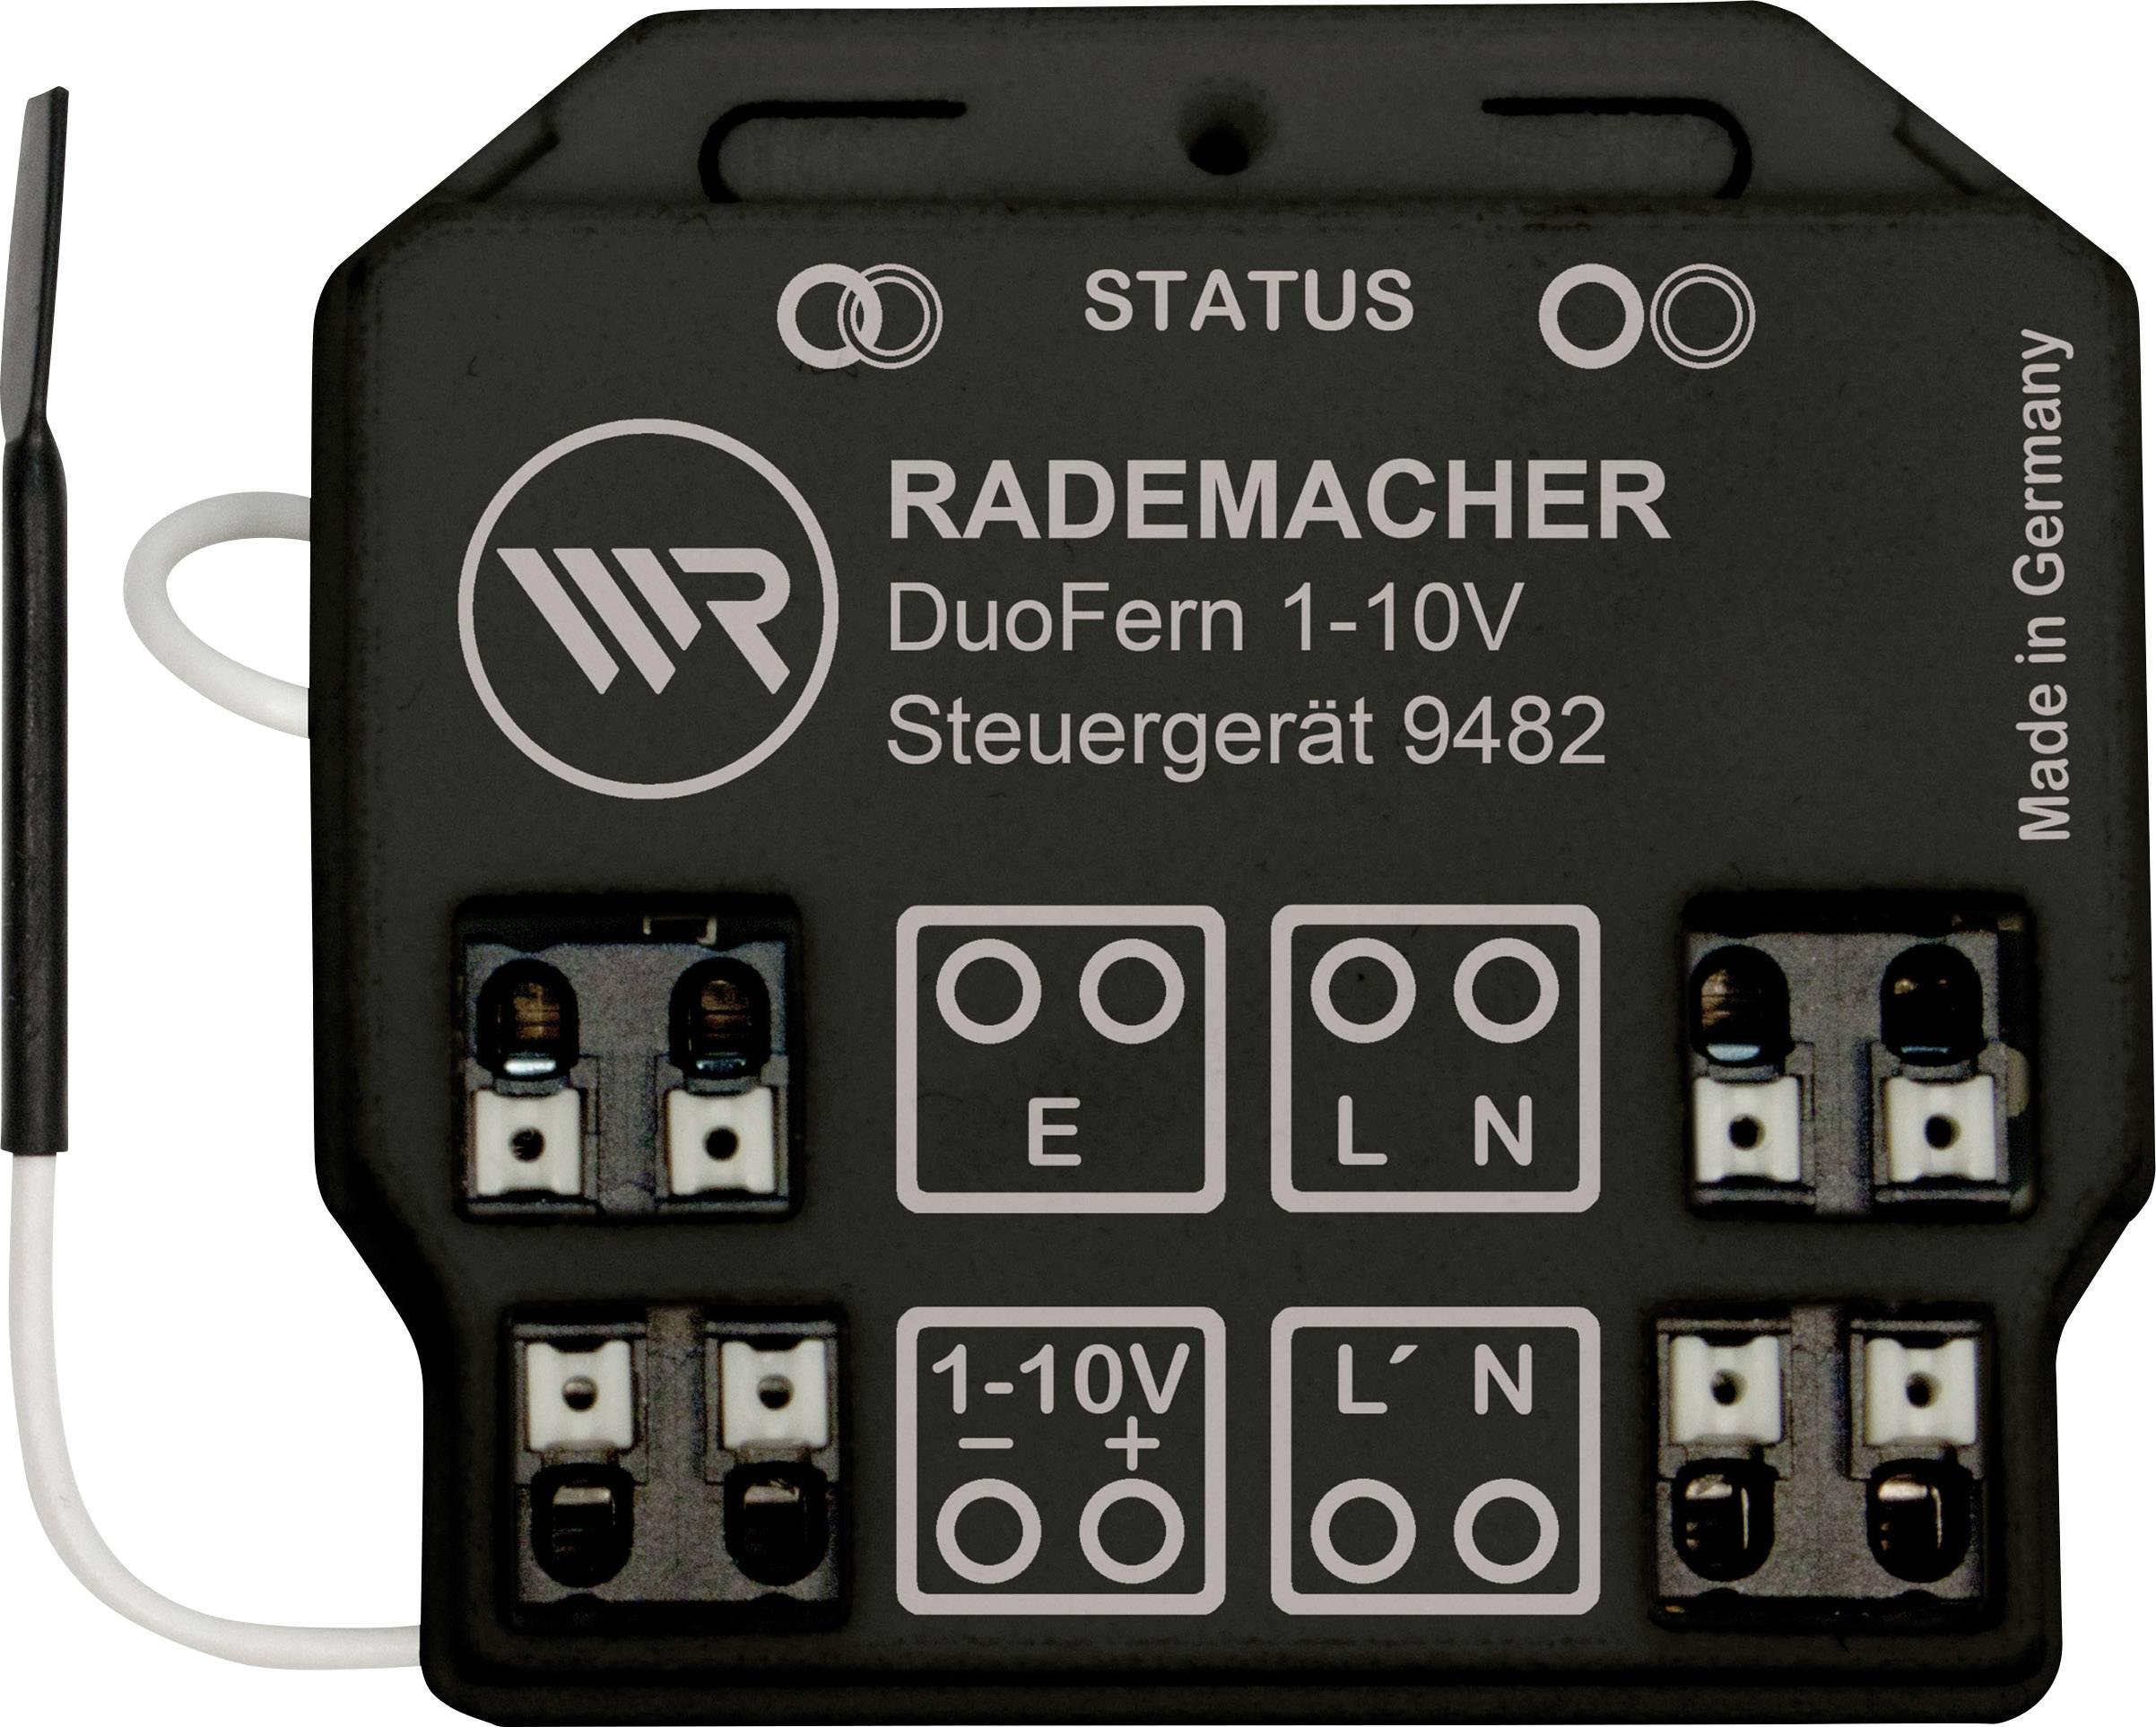 Bezdrôtový spínač WR Rademacher Rademacher DuoFern Steuergerät 1-10V DuoFern 35001262, 1-kanálový